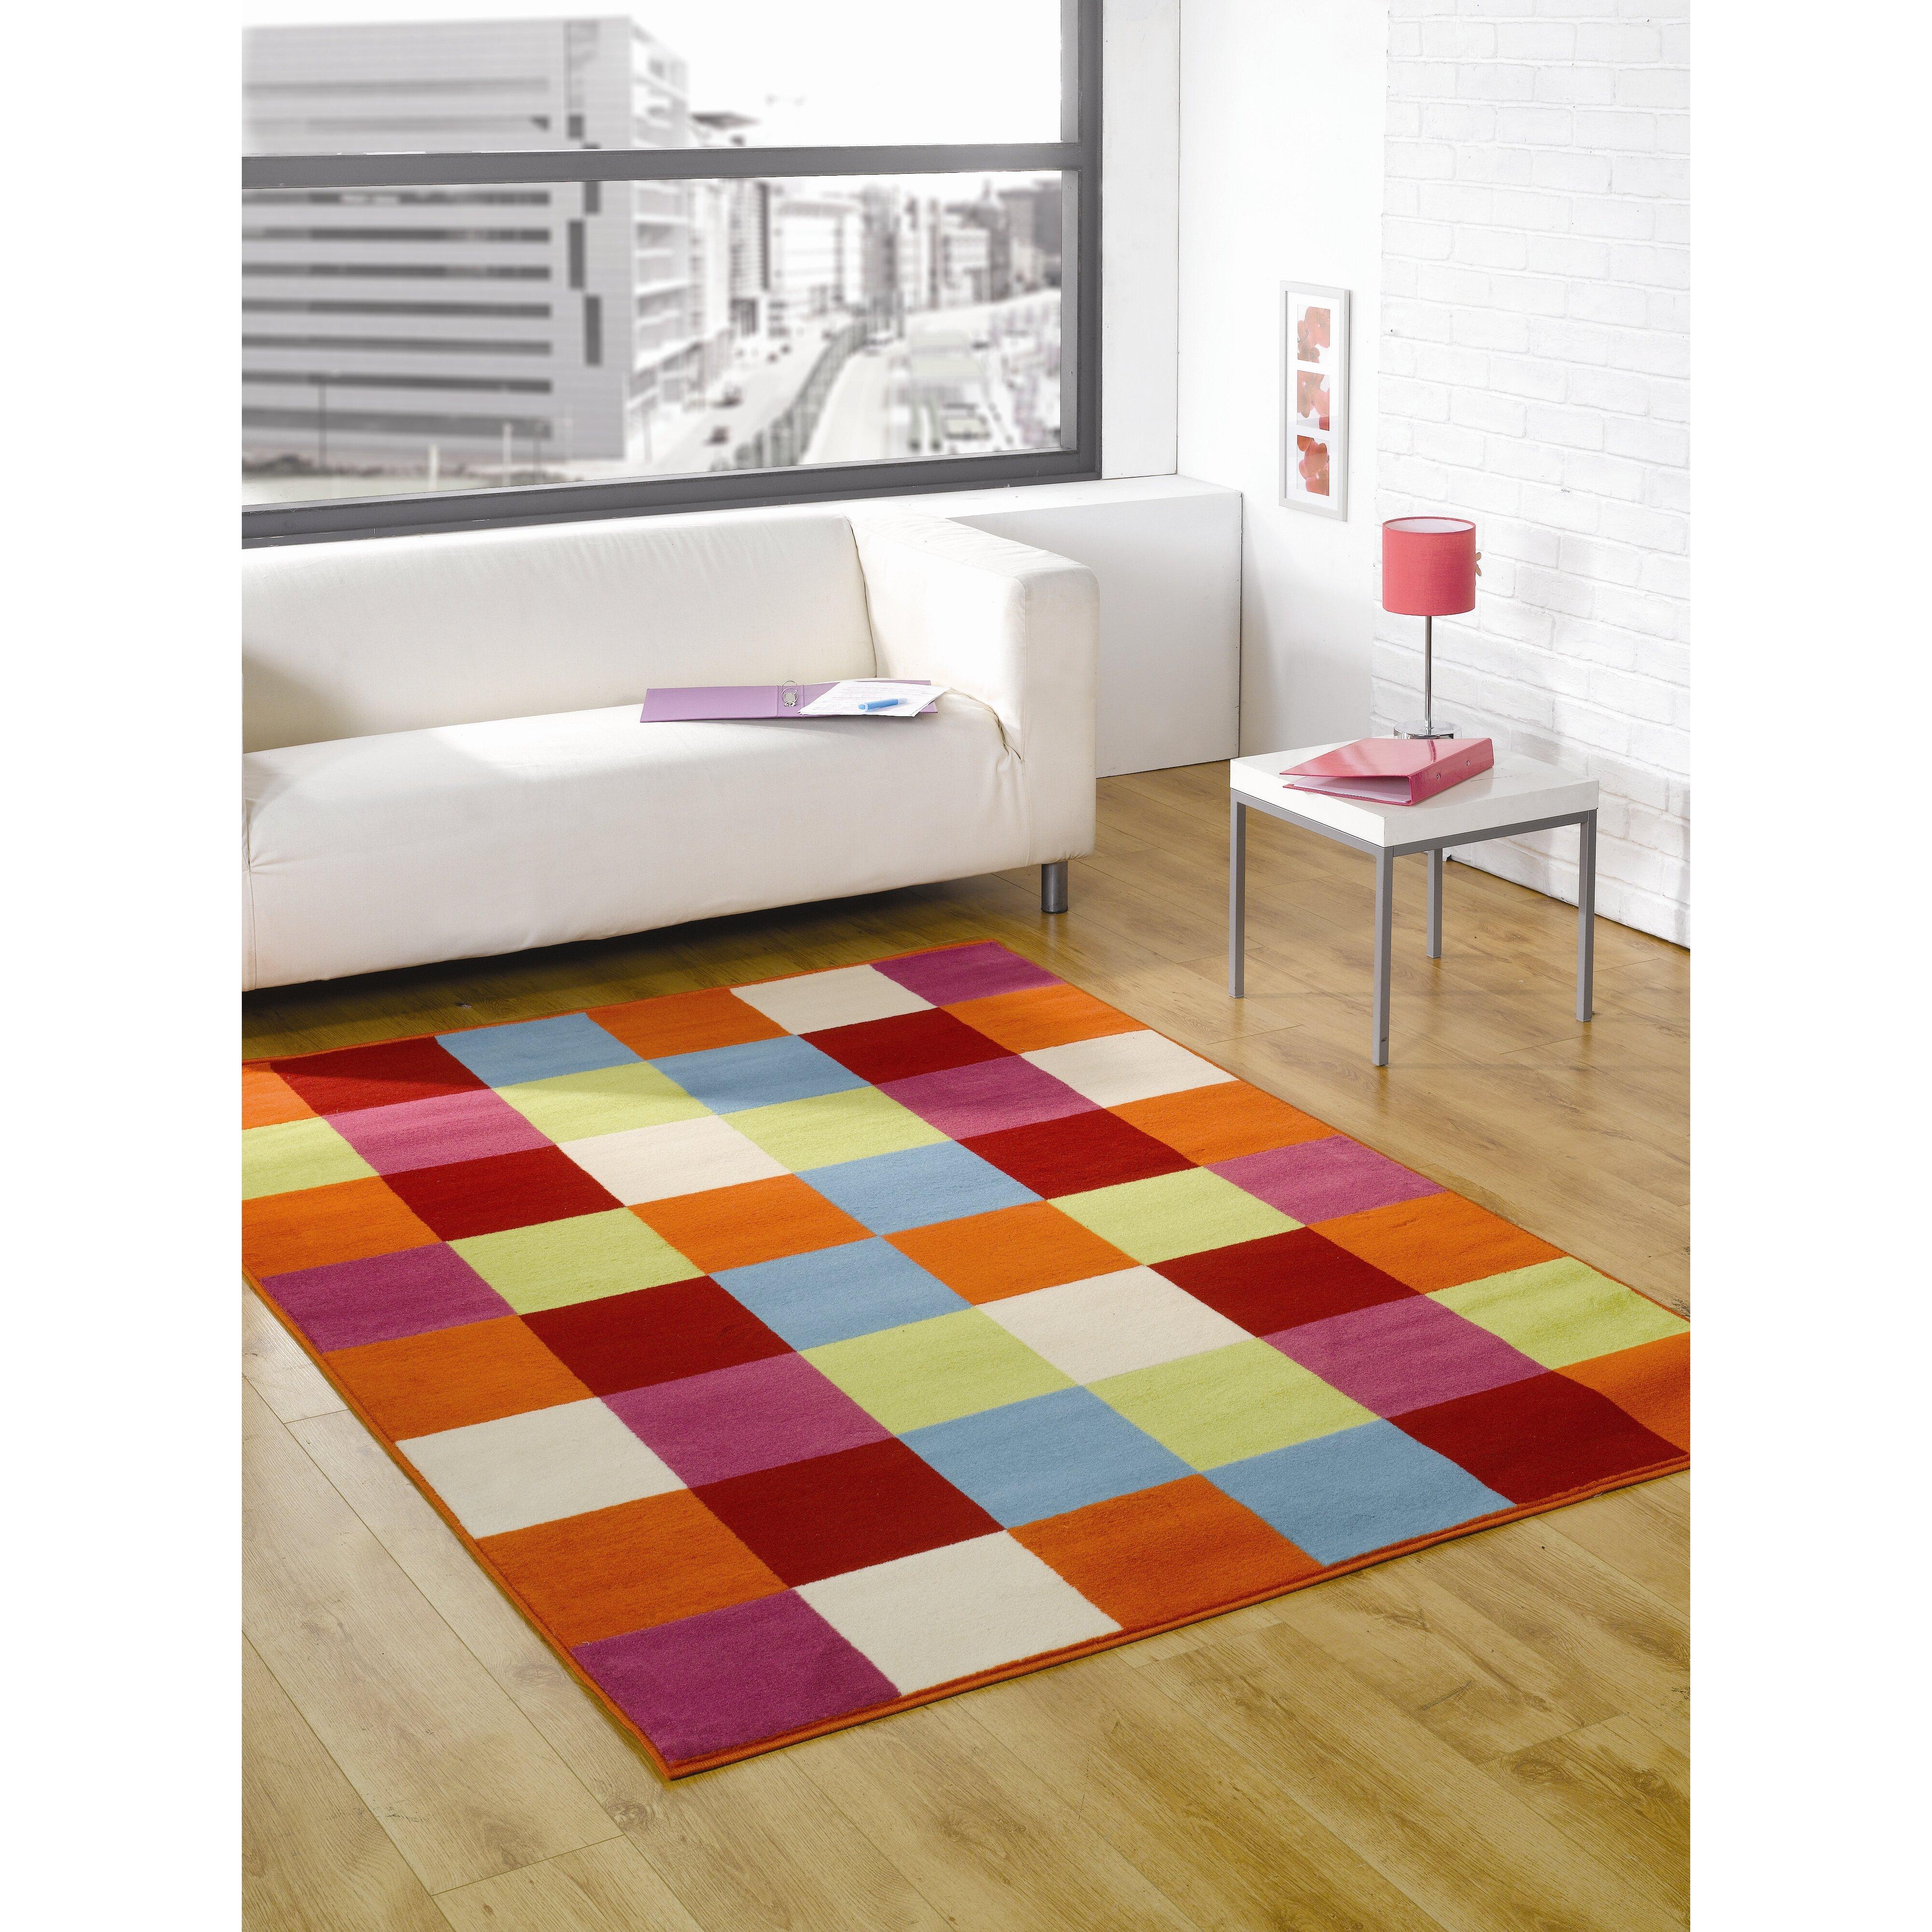 Funky Rainbow Colored Area Rugs: House Additions Retro Funky Multi-Coloured Area Rug